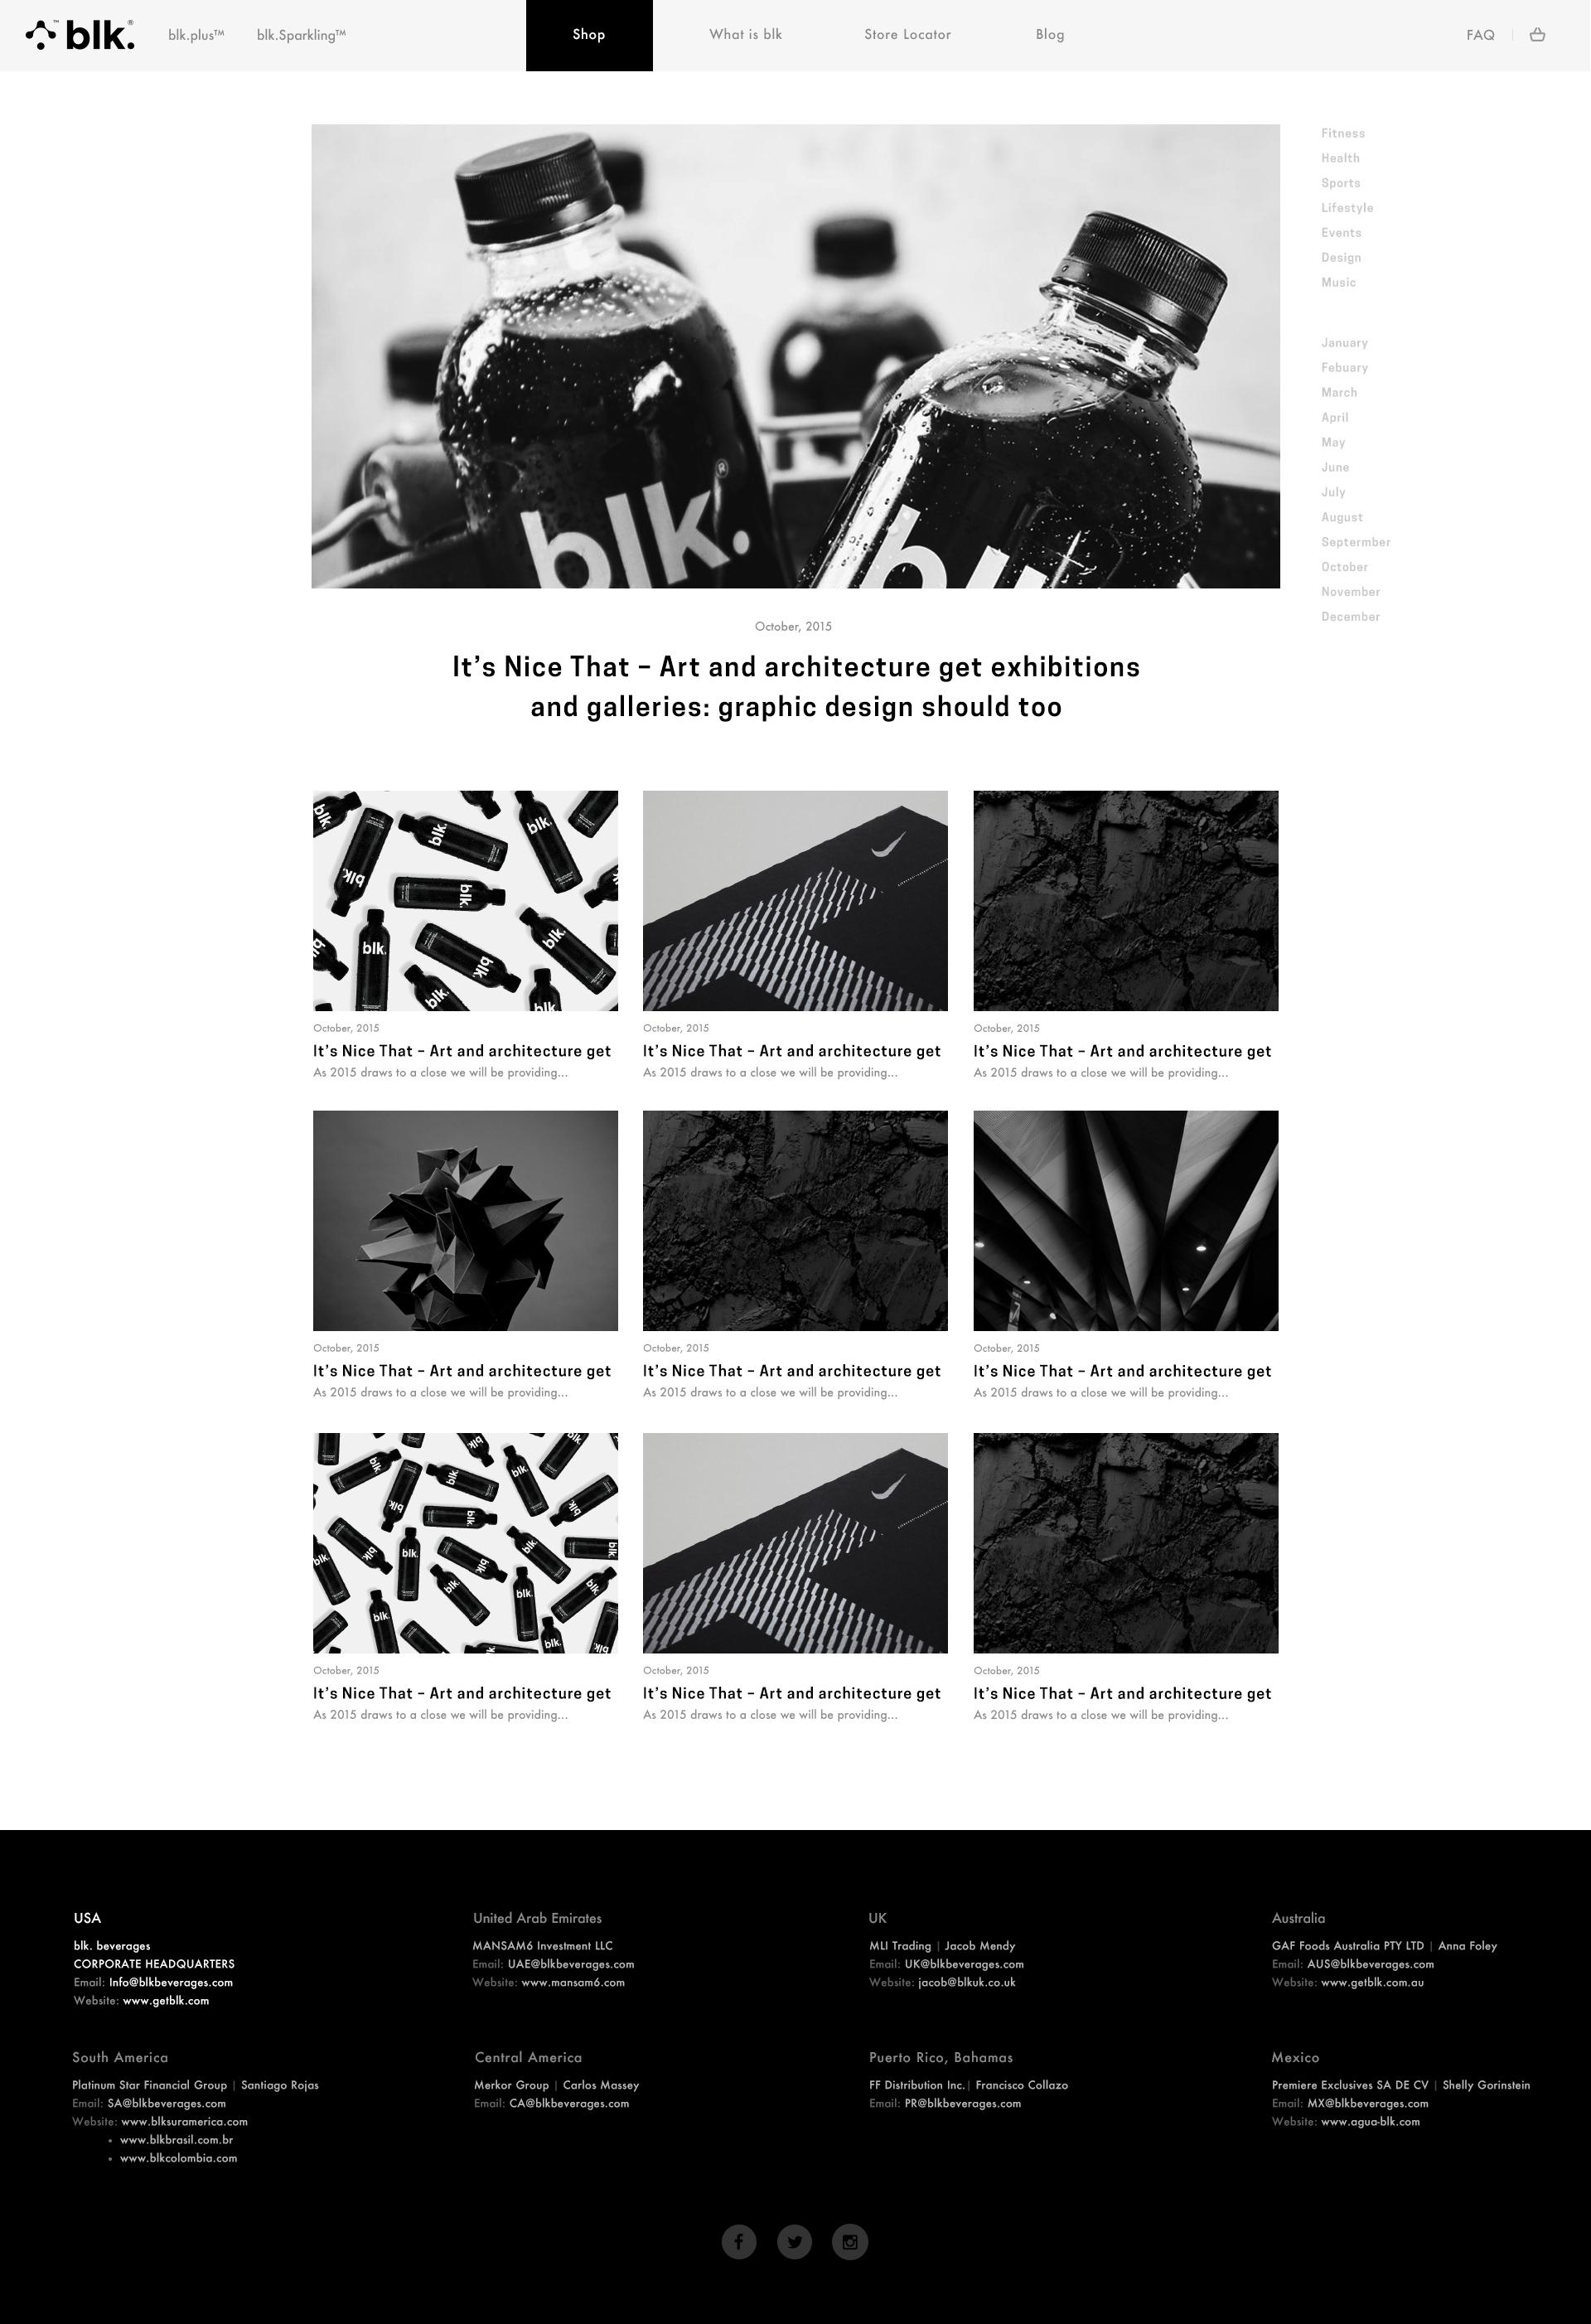 Blk Web Design